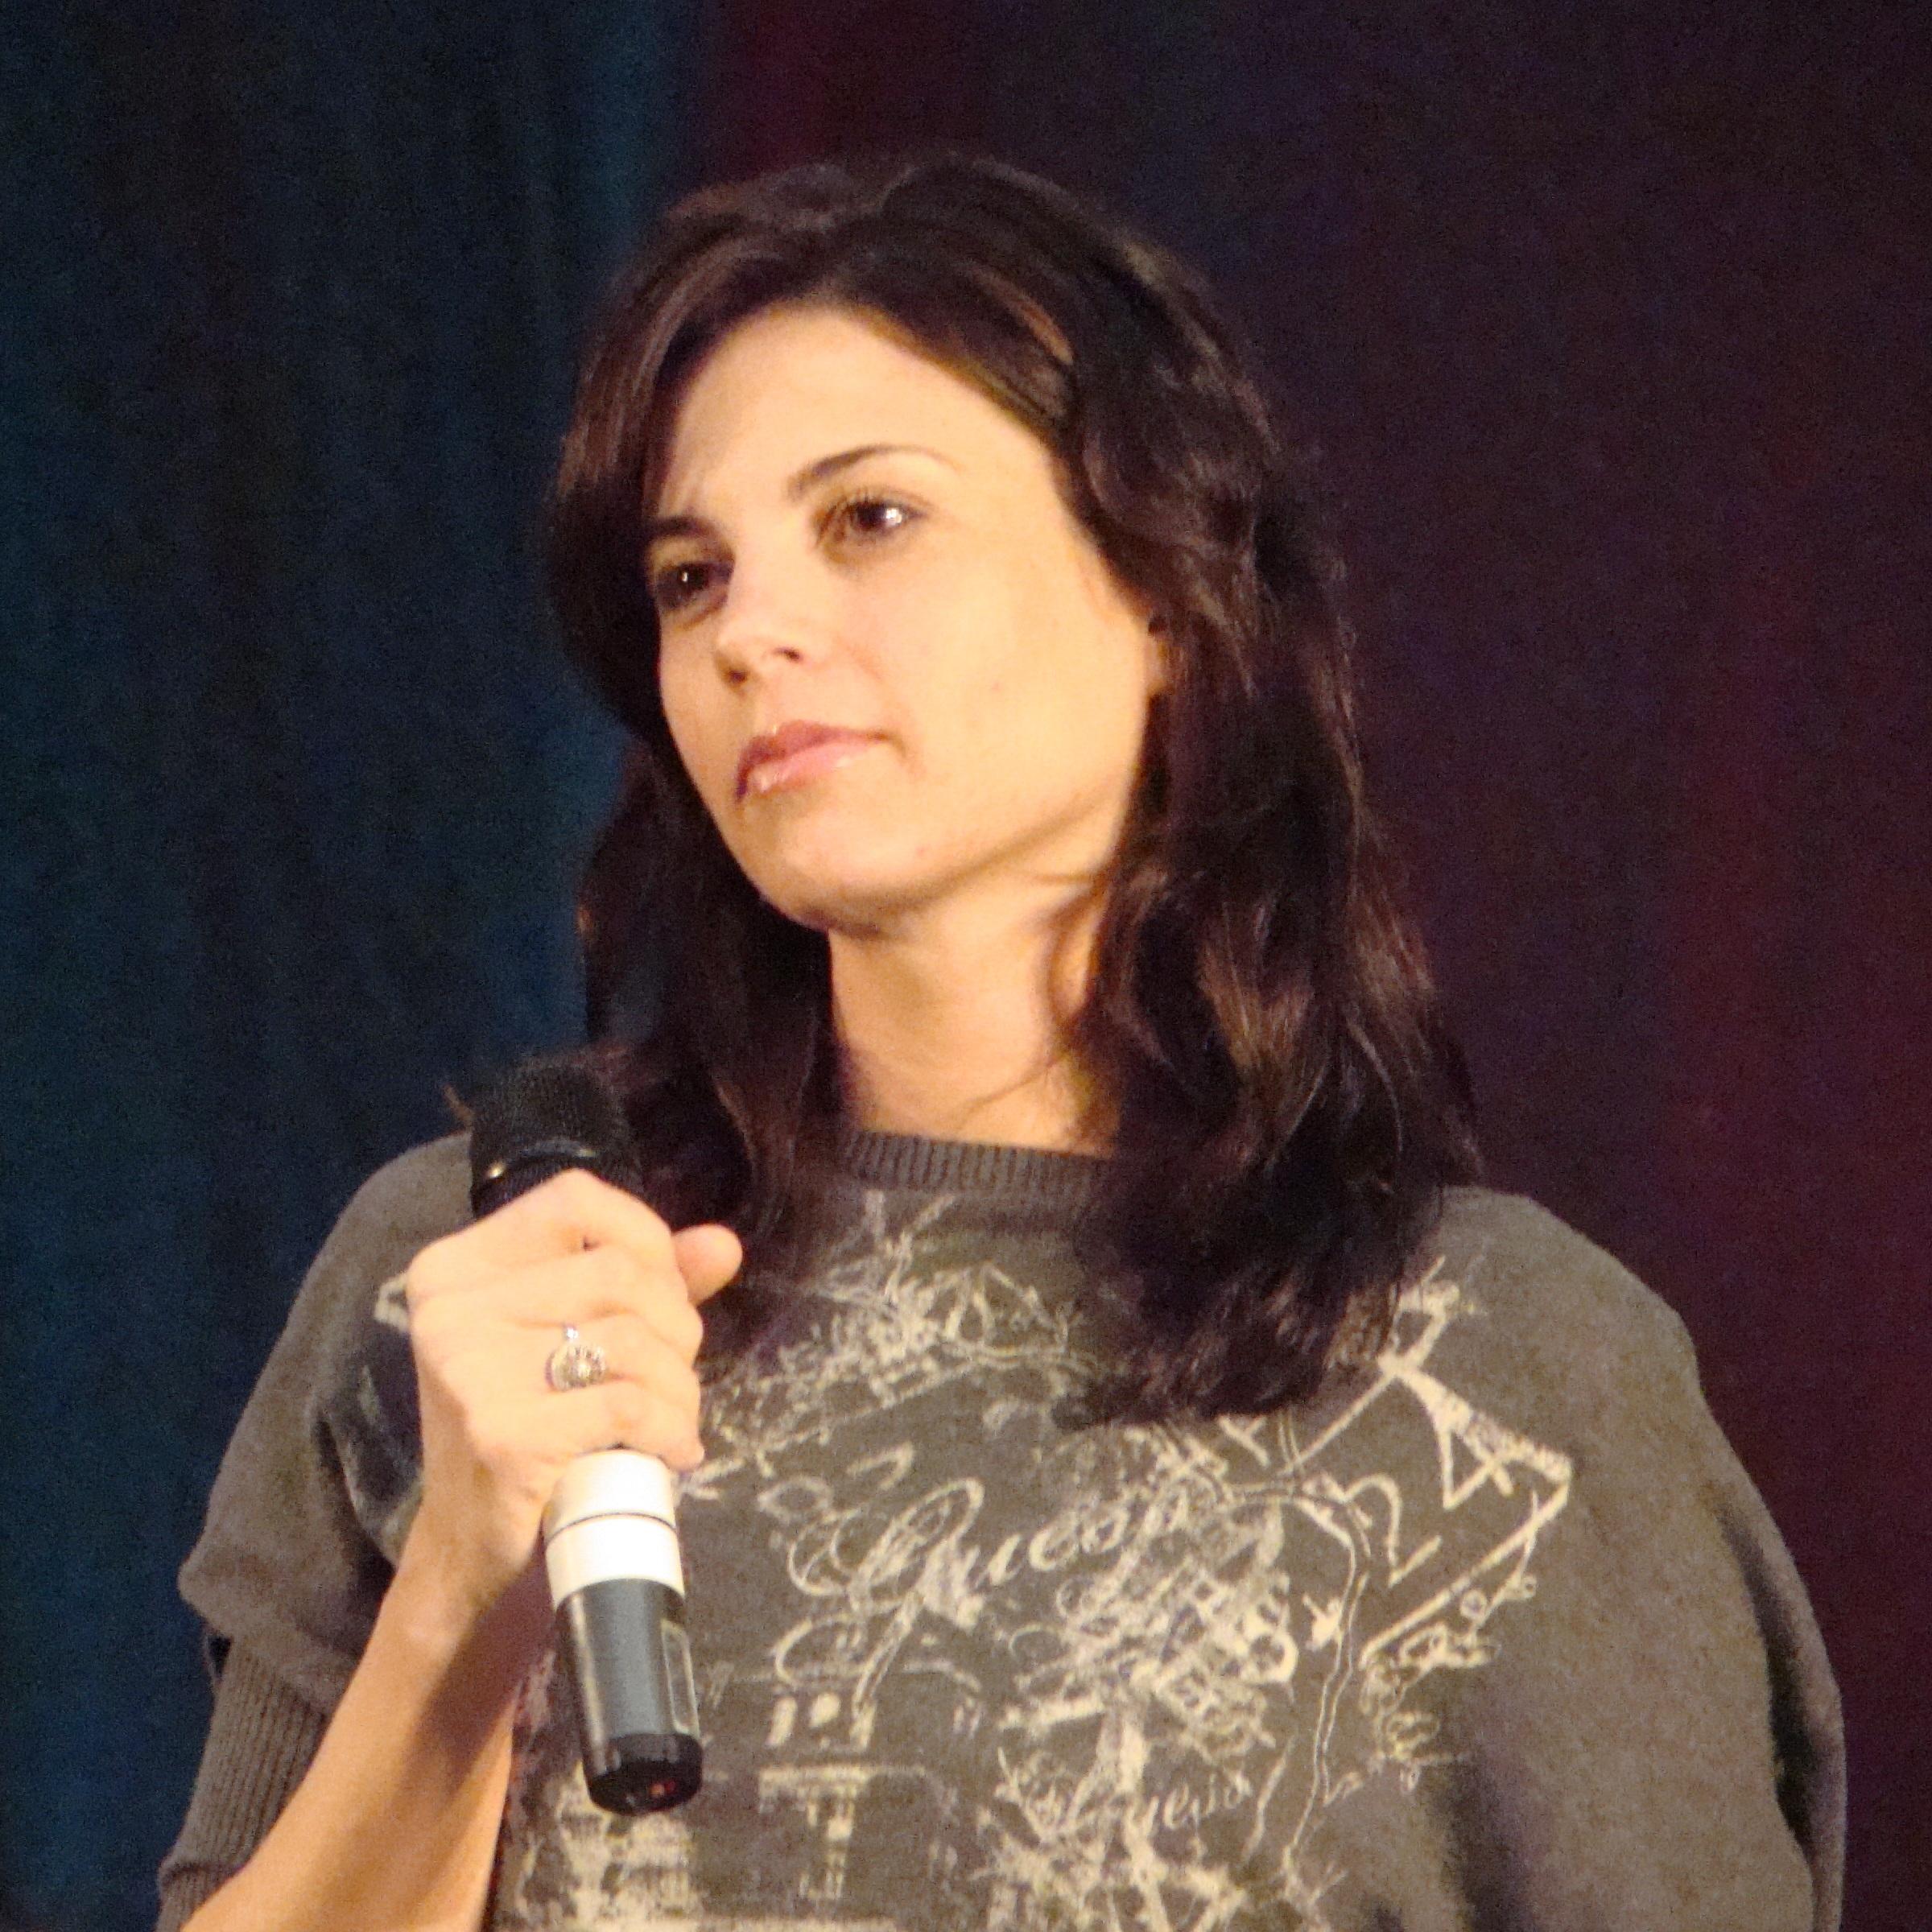 Leah Cairns in November 2009